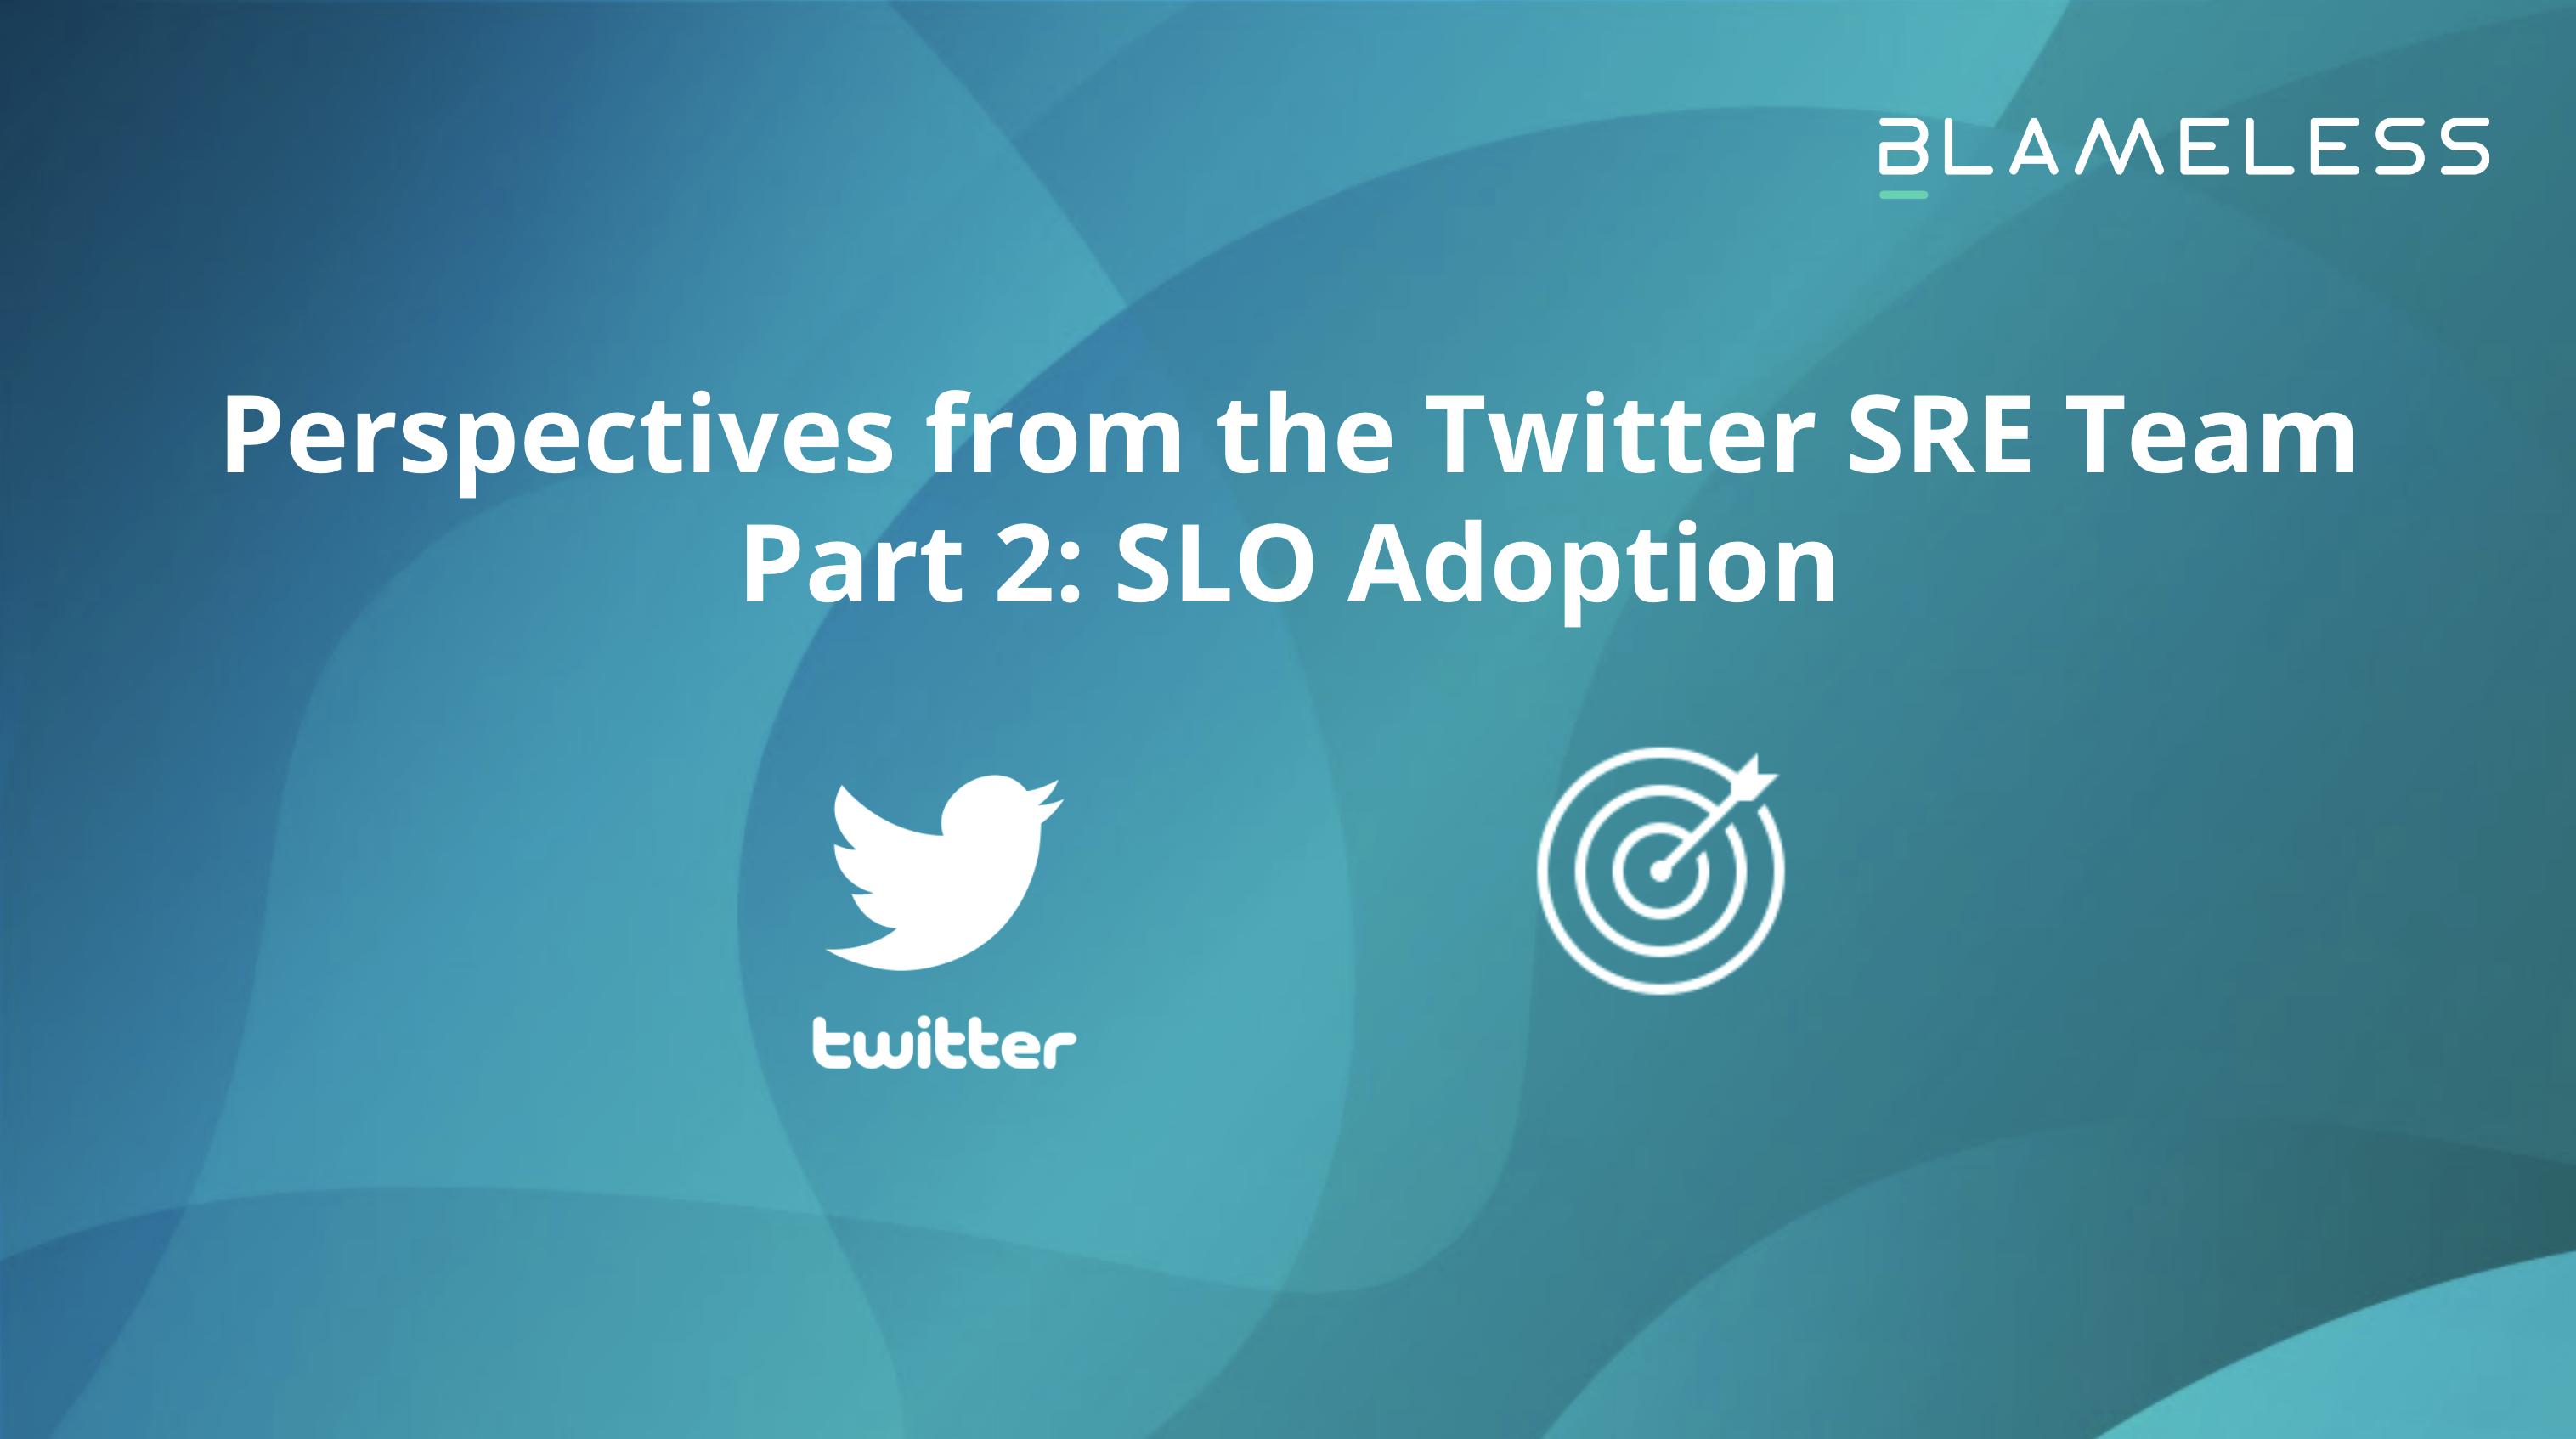 SLO Adoption at Twitter